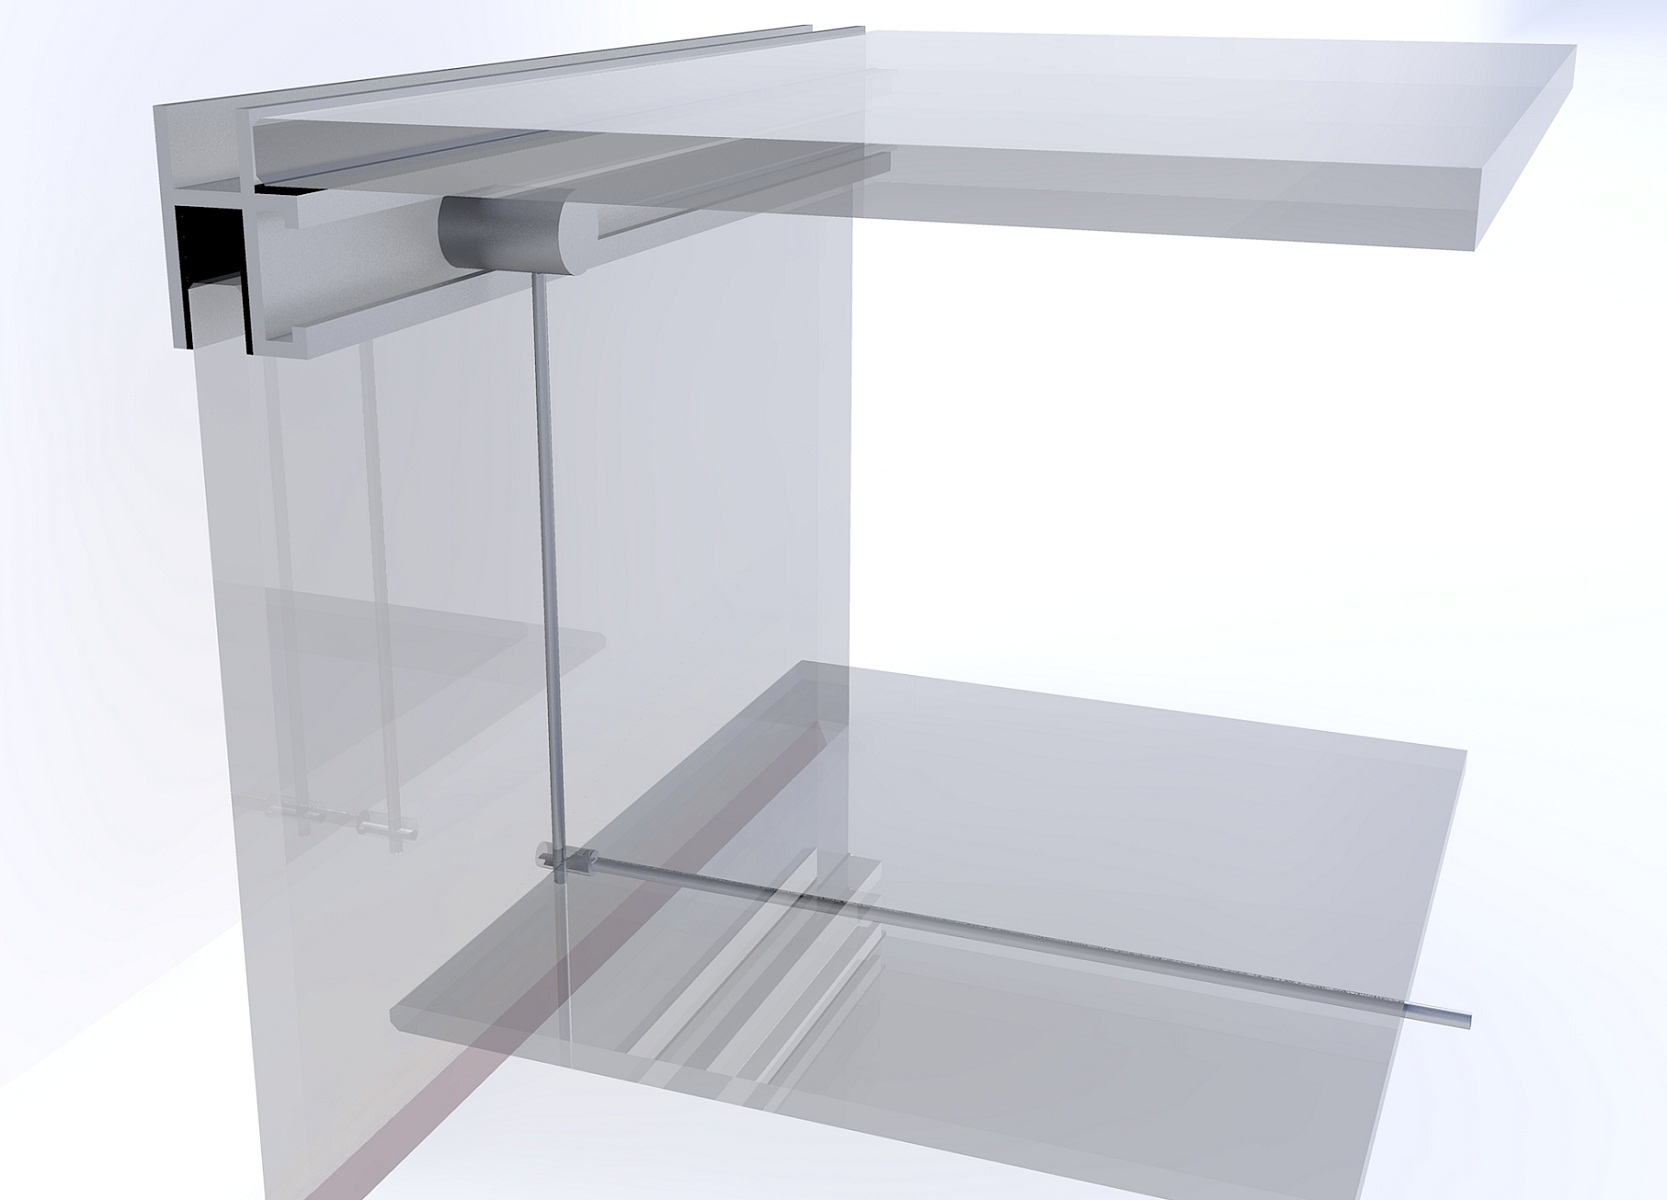 Verwonderend Glascom Showcases - Schappen IQ-62